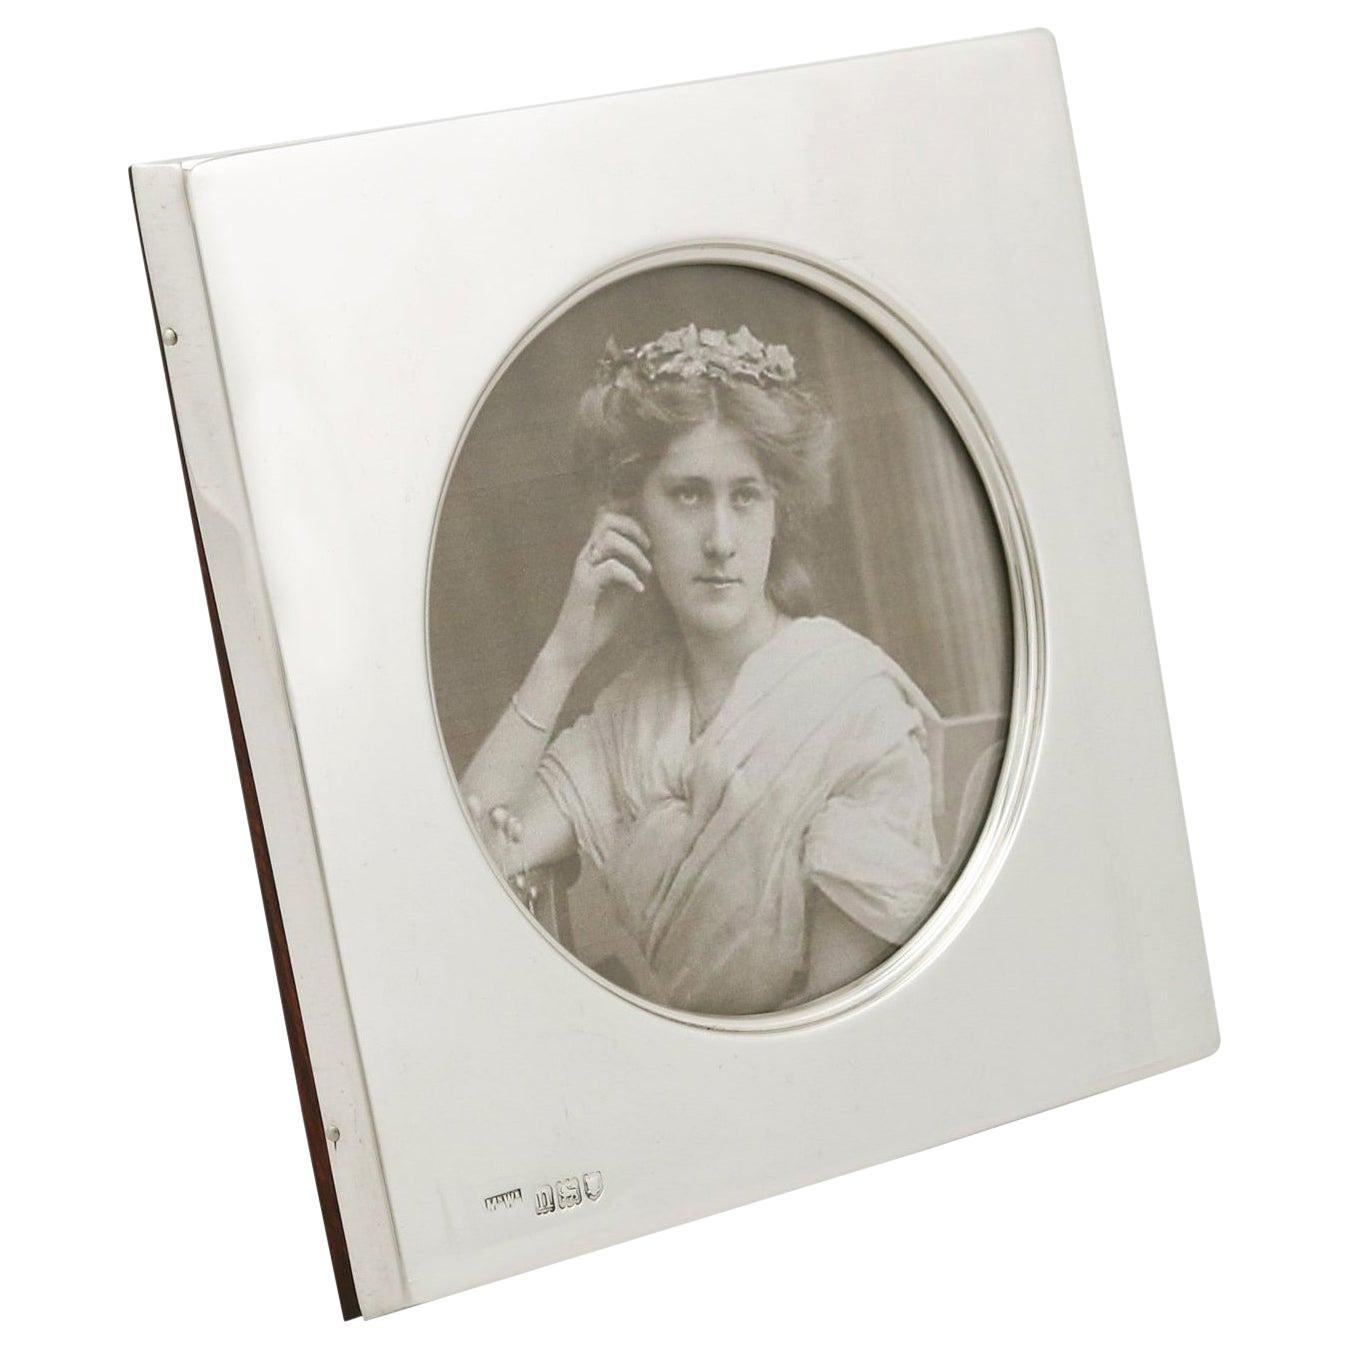 1900s Edwardian Sterling Silver Photograph Frame